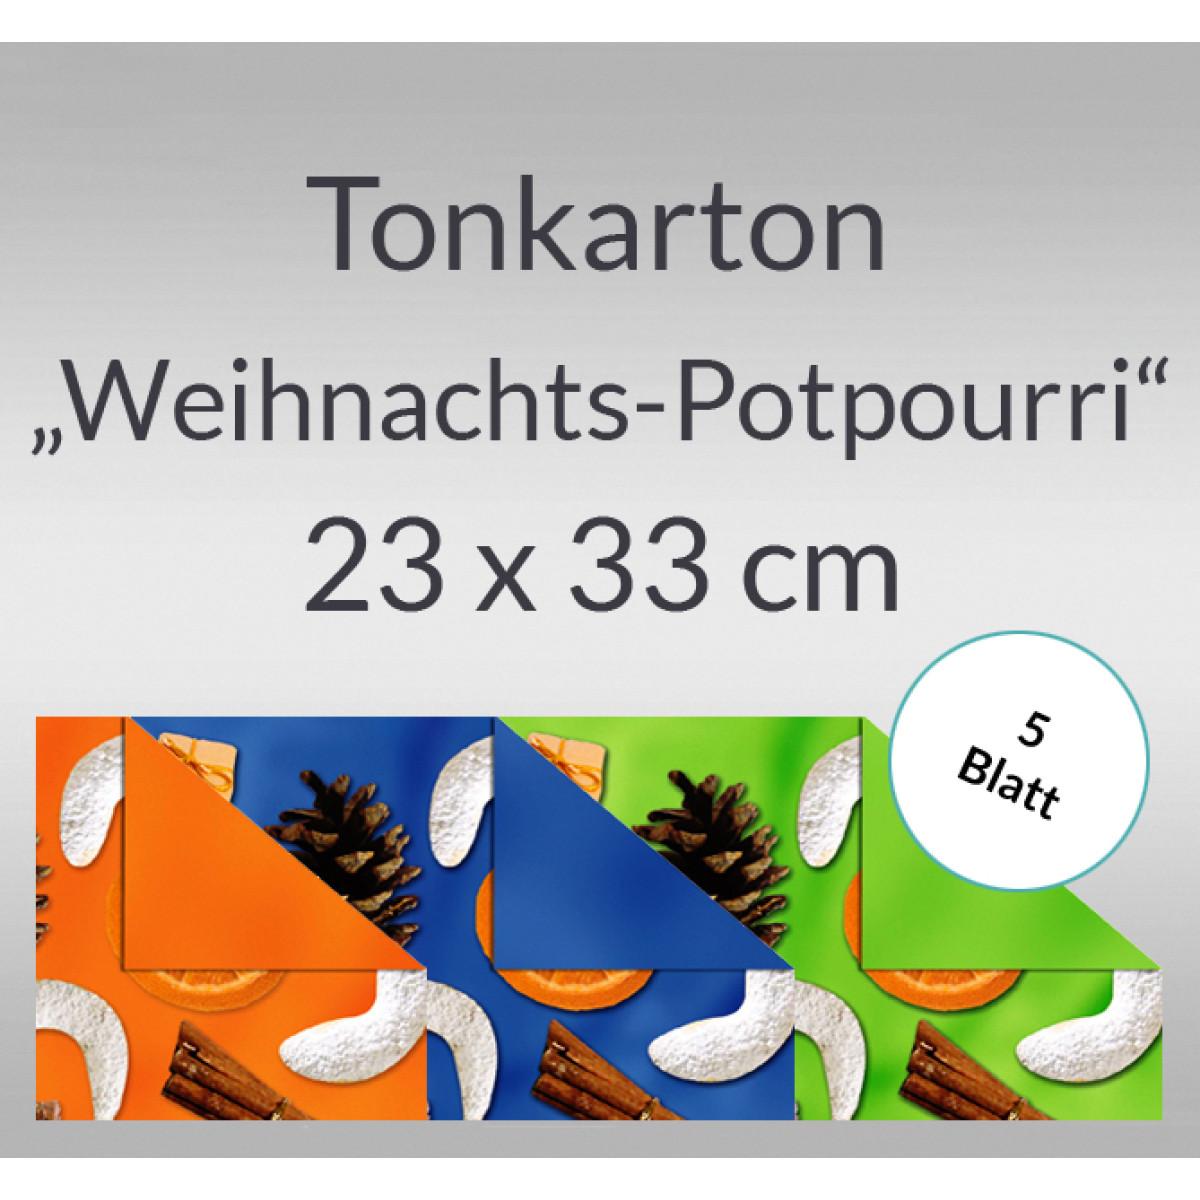 "Tonkarton ""Weihnachts-Potpourri"" 220 g/qm 23 x 33 cm - 5 Blatt"